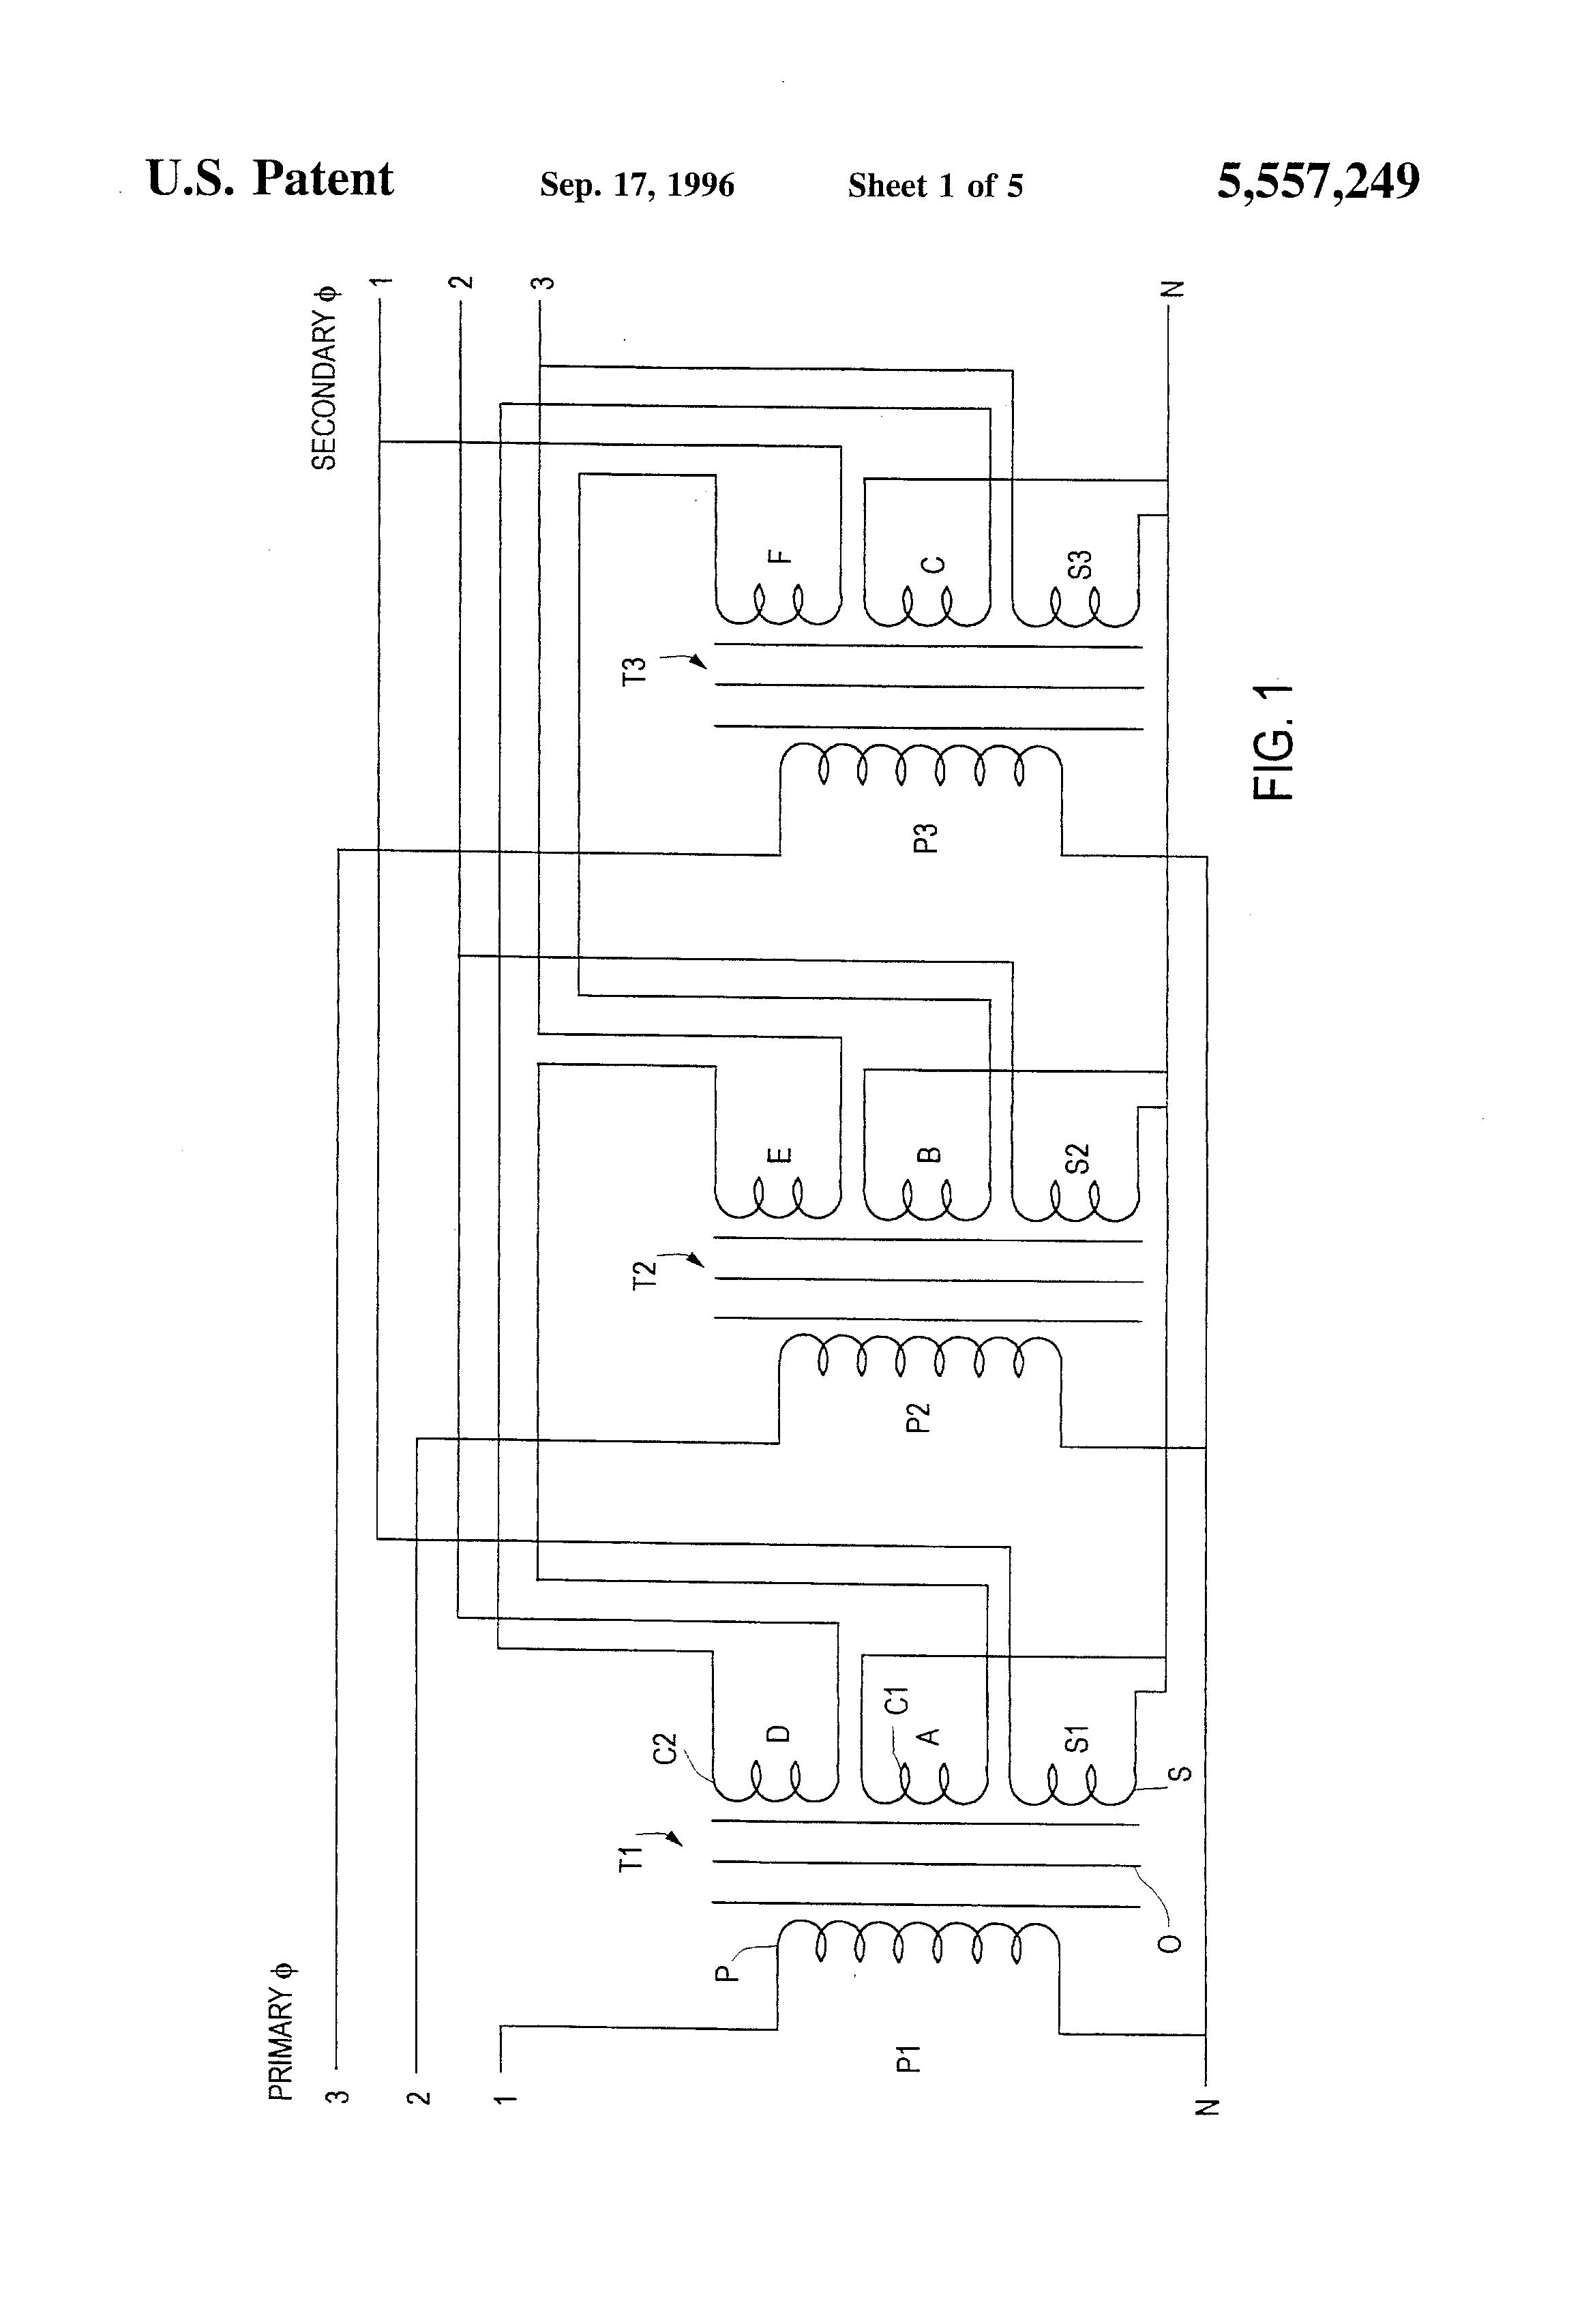 Rtcc Panel Wiring Diagram : Patent us load balancing transformer google patents